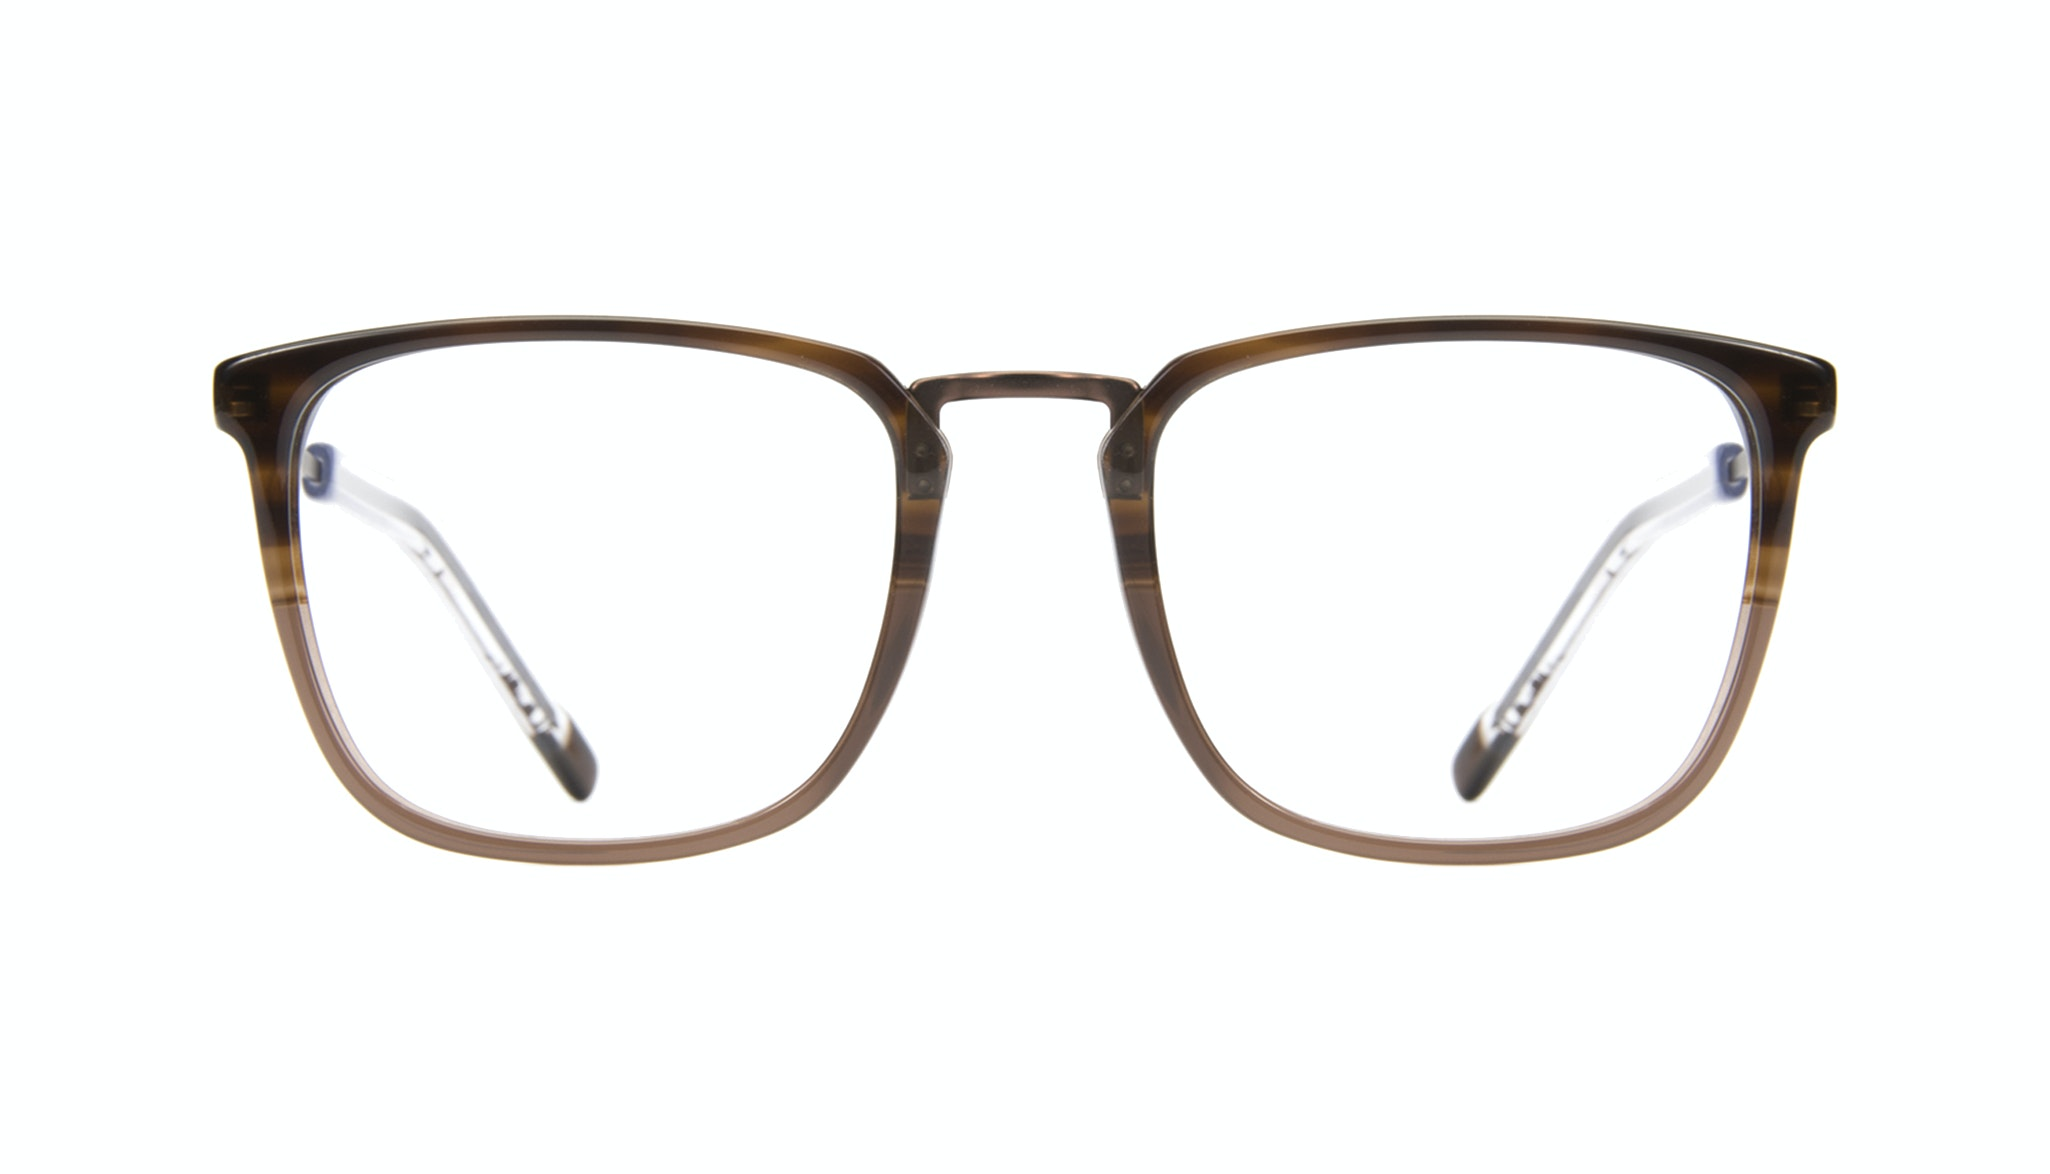 Affordable Fashion Glasses Rectangle Square Eyeglasses Men Current Mud